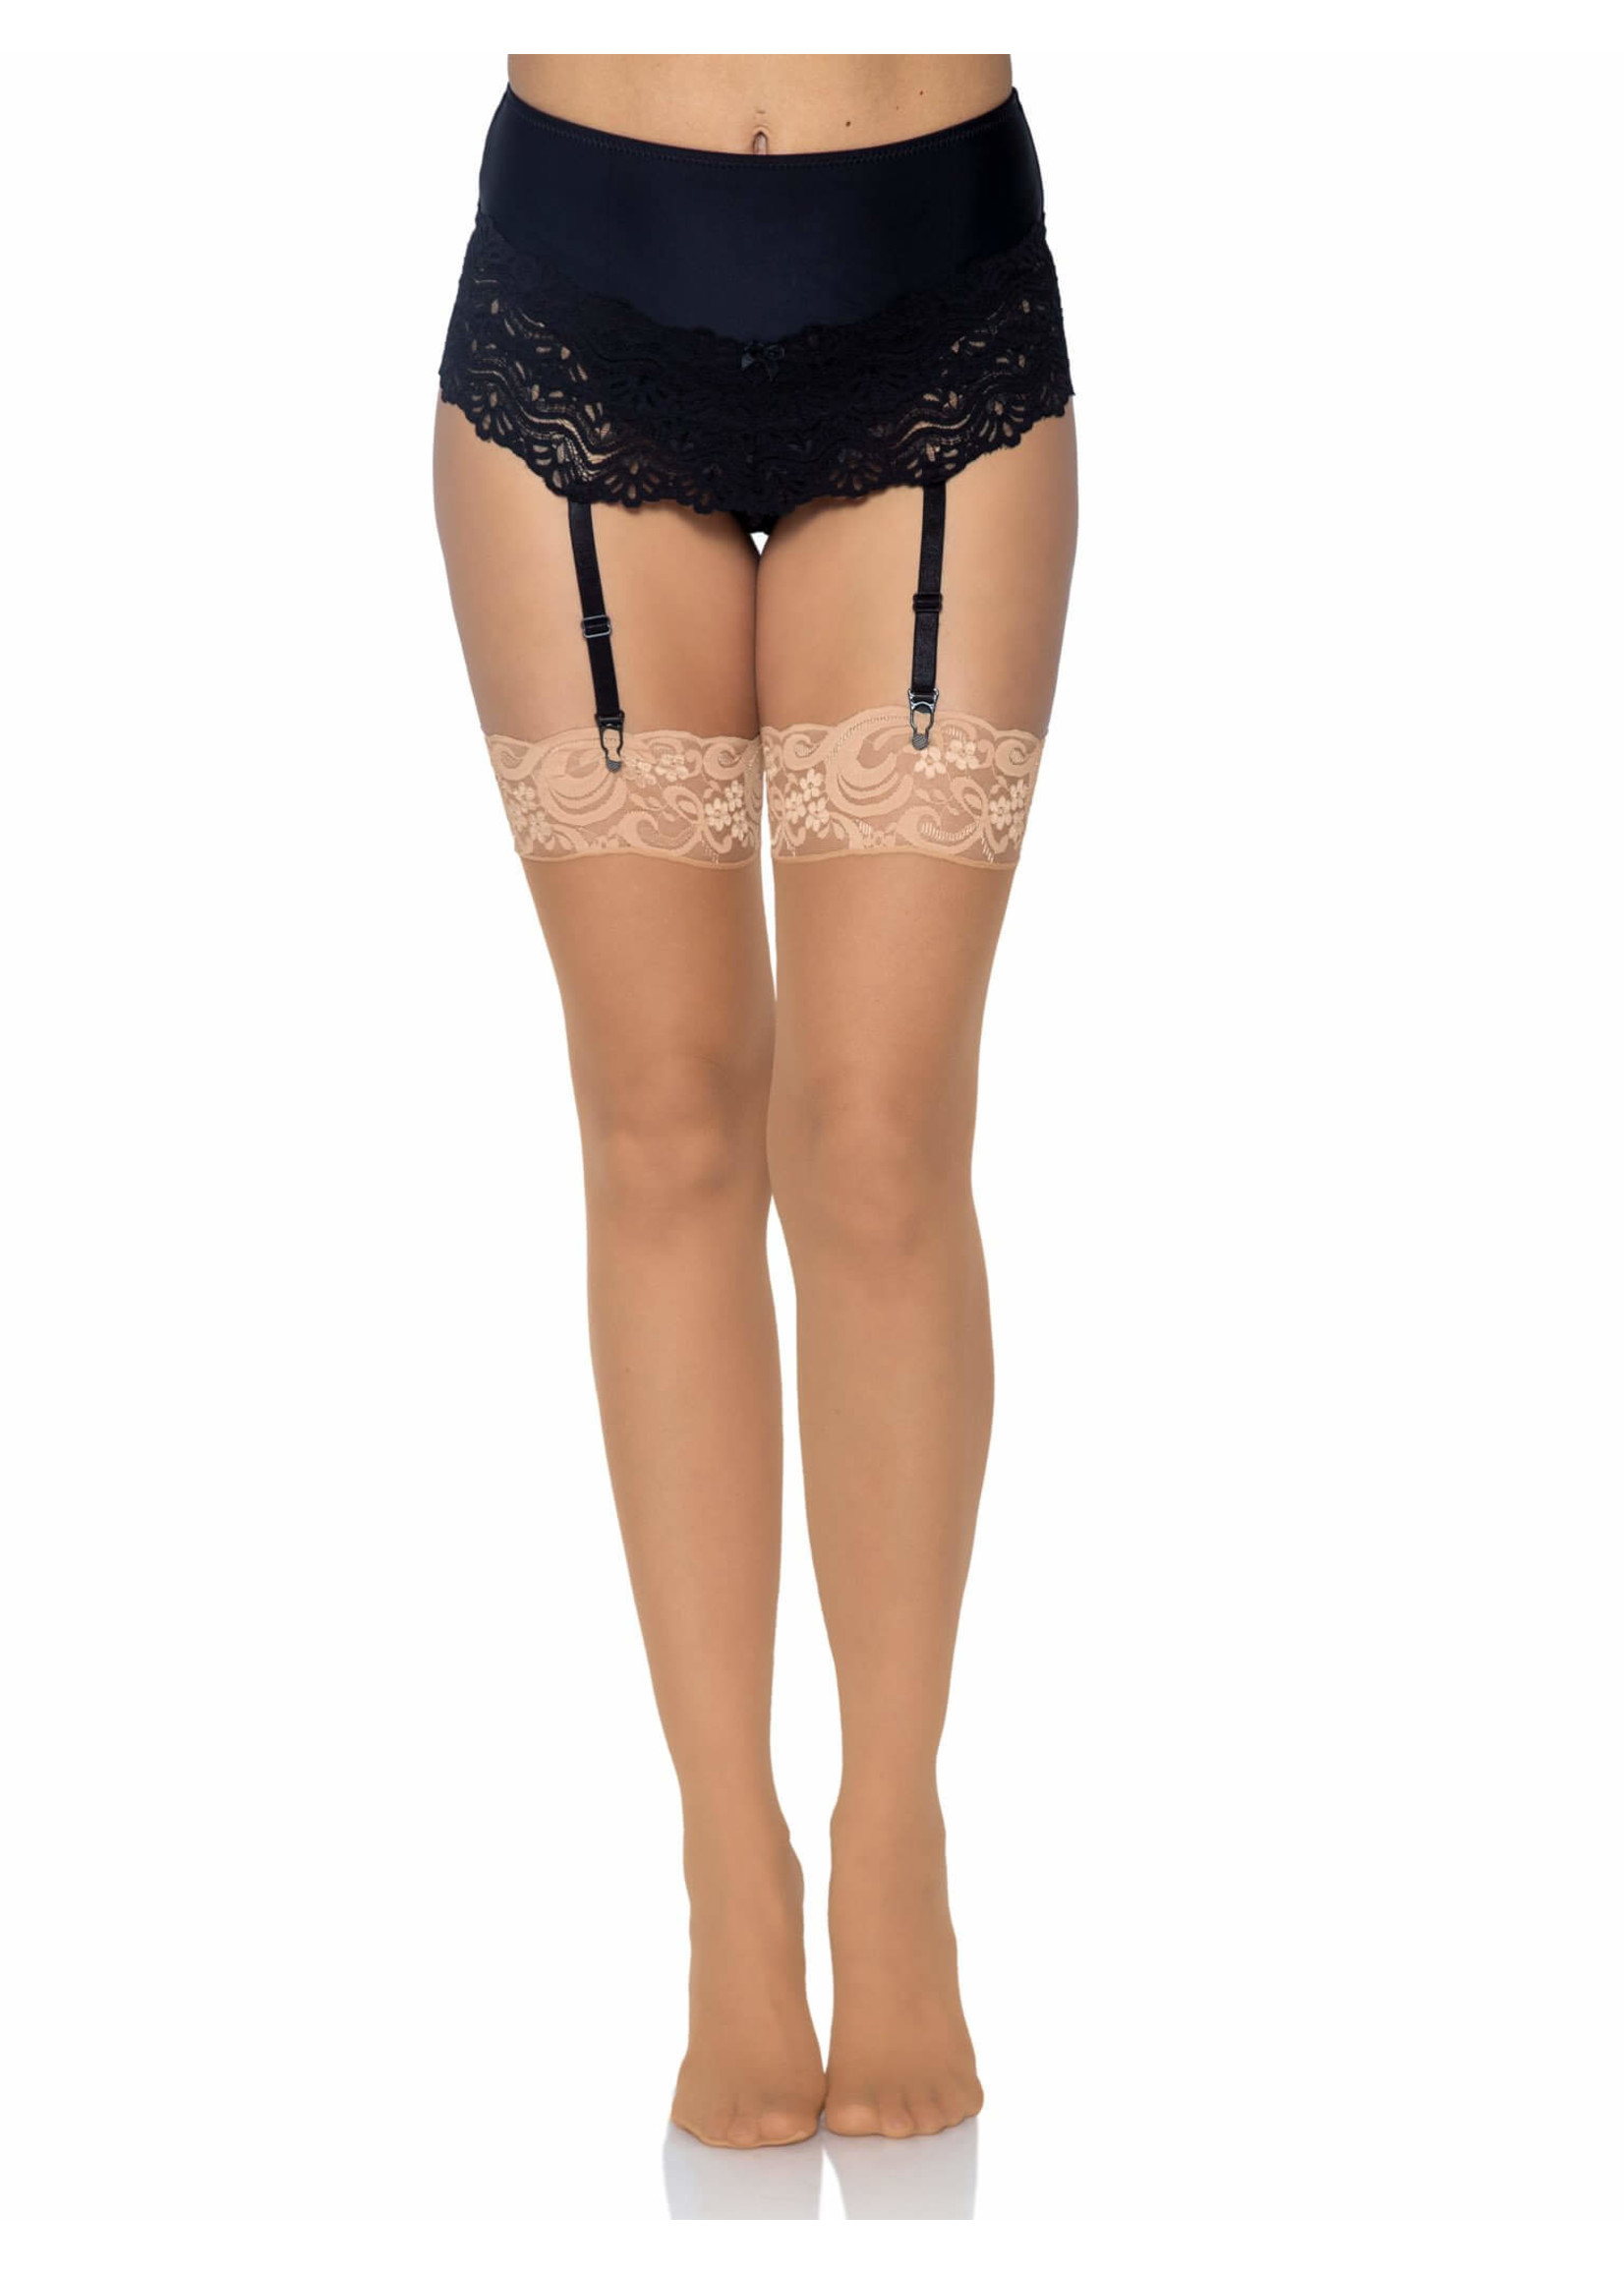 Leg Avenue Alix Sheer Thigh High Stockings